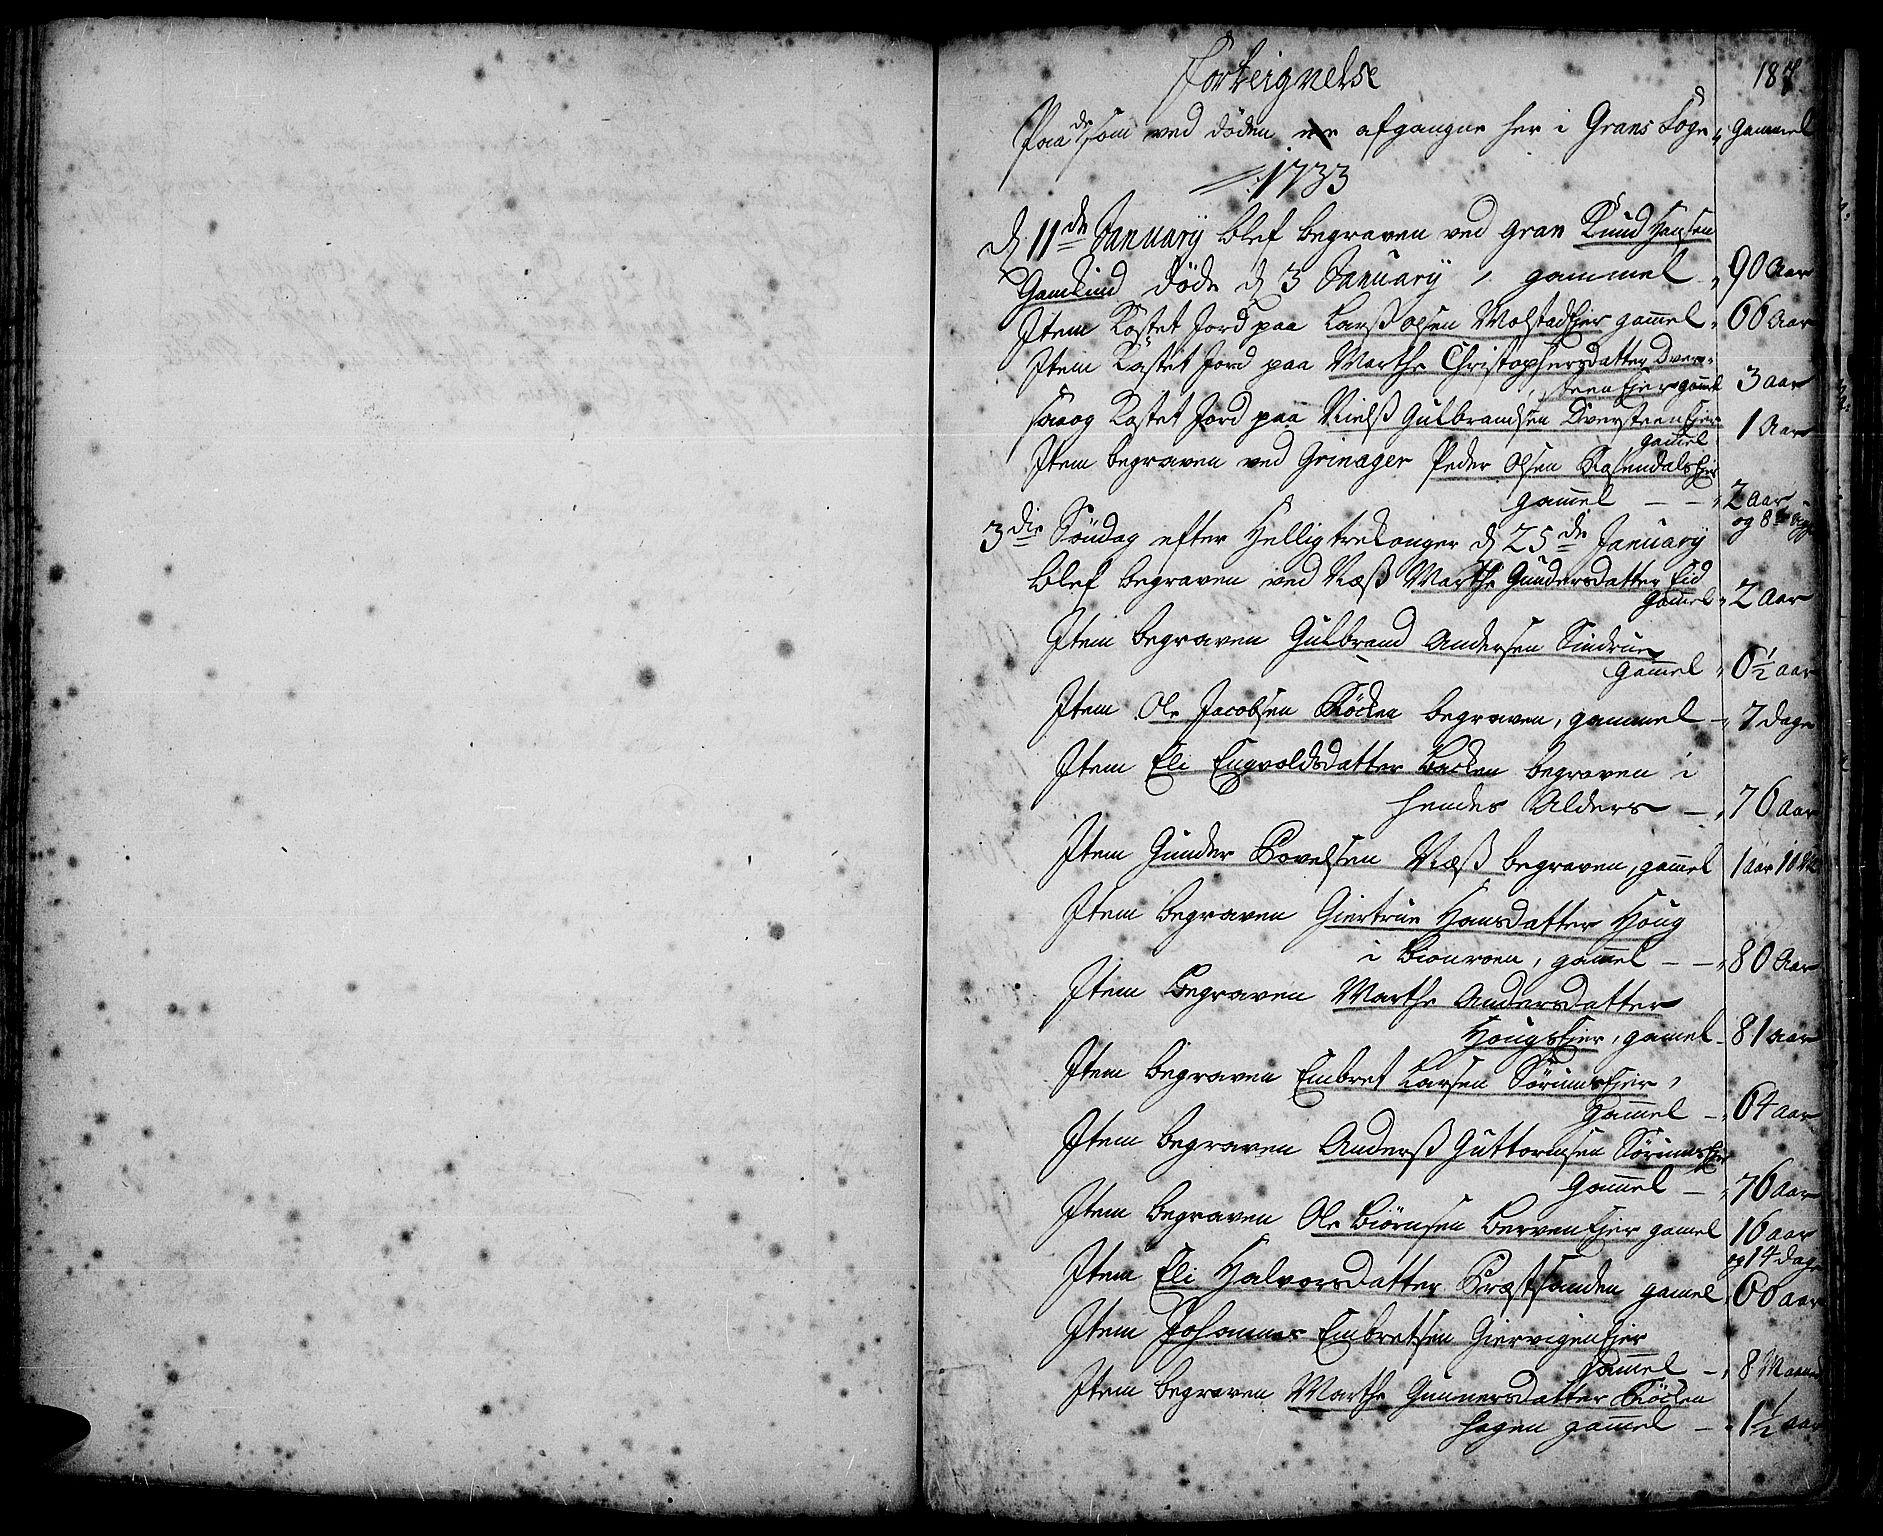 SAH, Gran prestekontor, Ministerialbok nr. 2, 1732-1744, s. 187